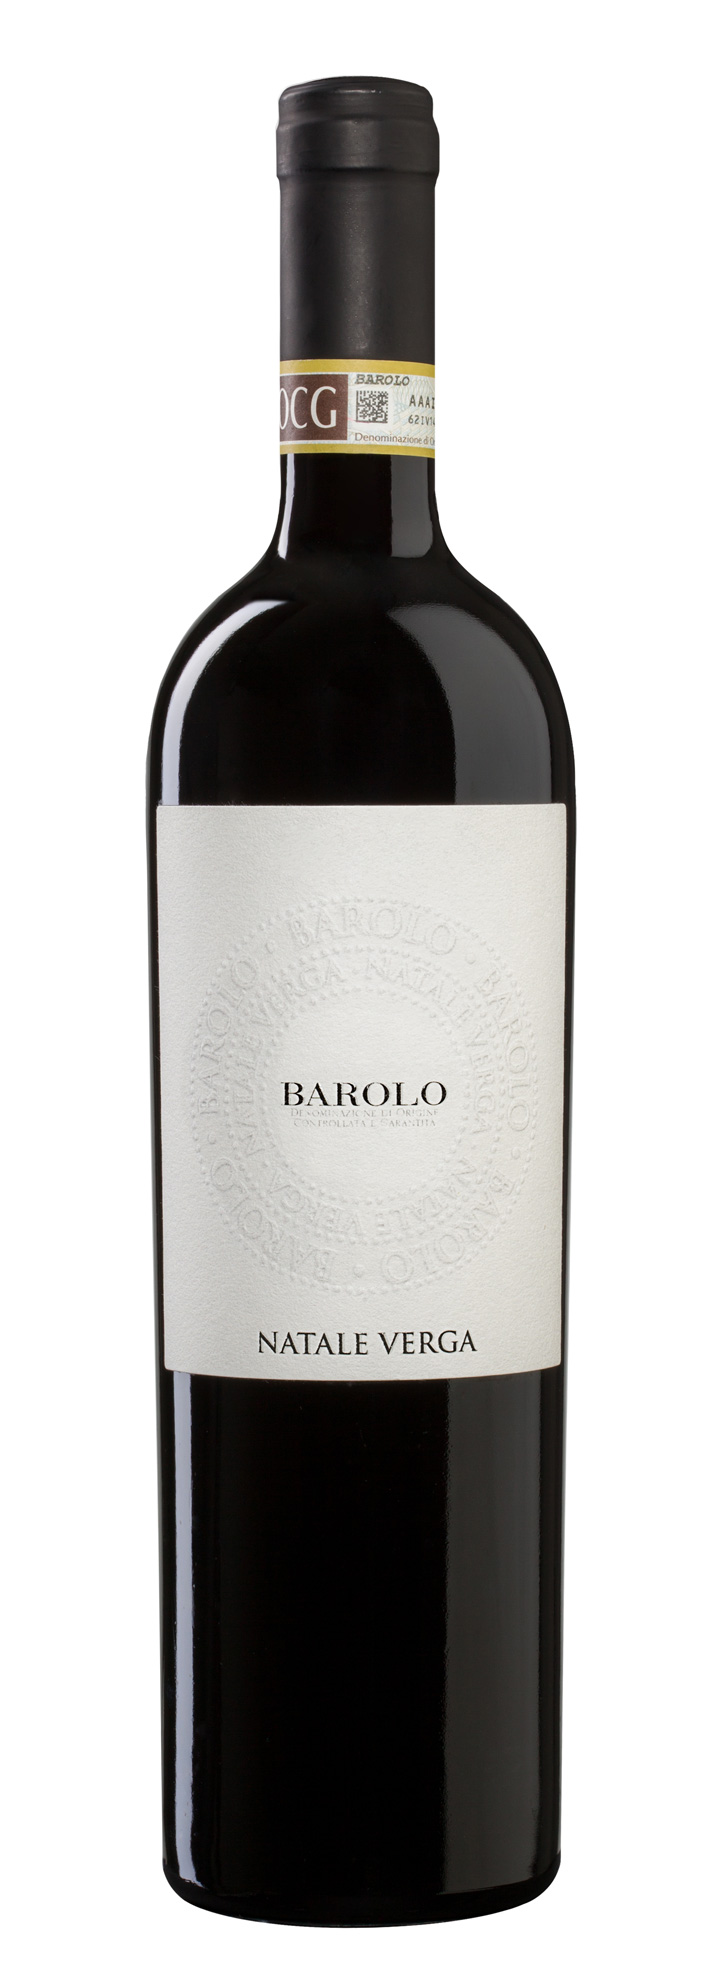 BAROLO DOCG 2012 NATALE VERGA 0,75l 14,5%